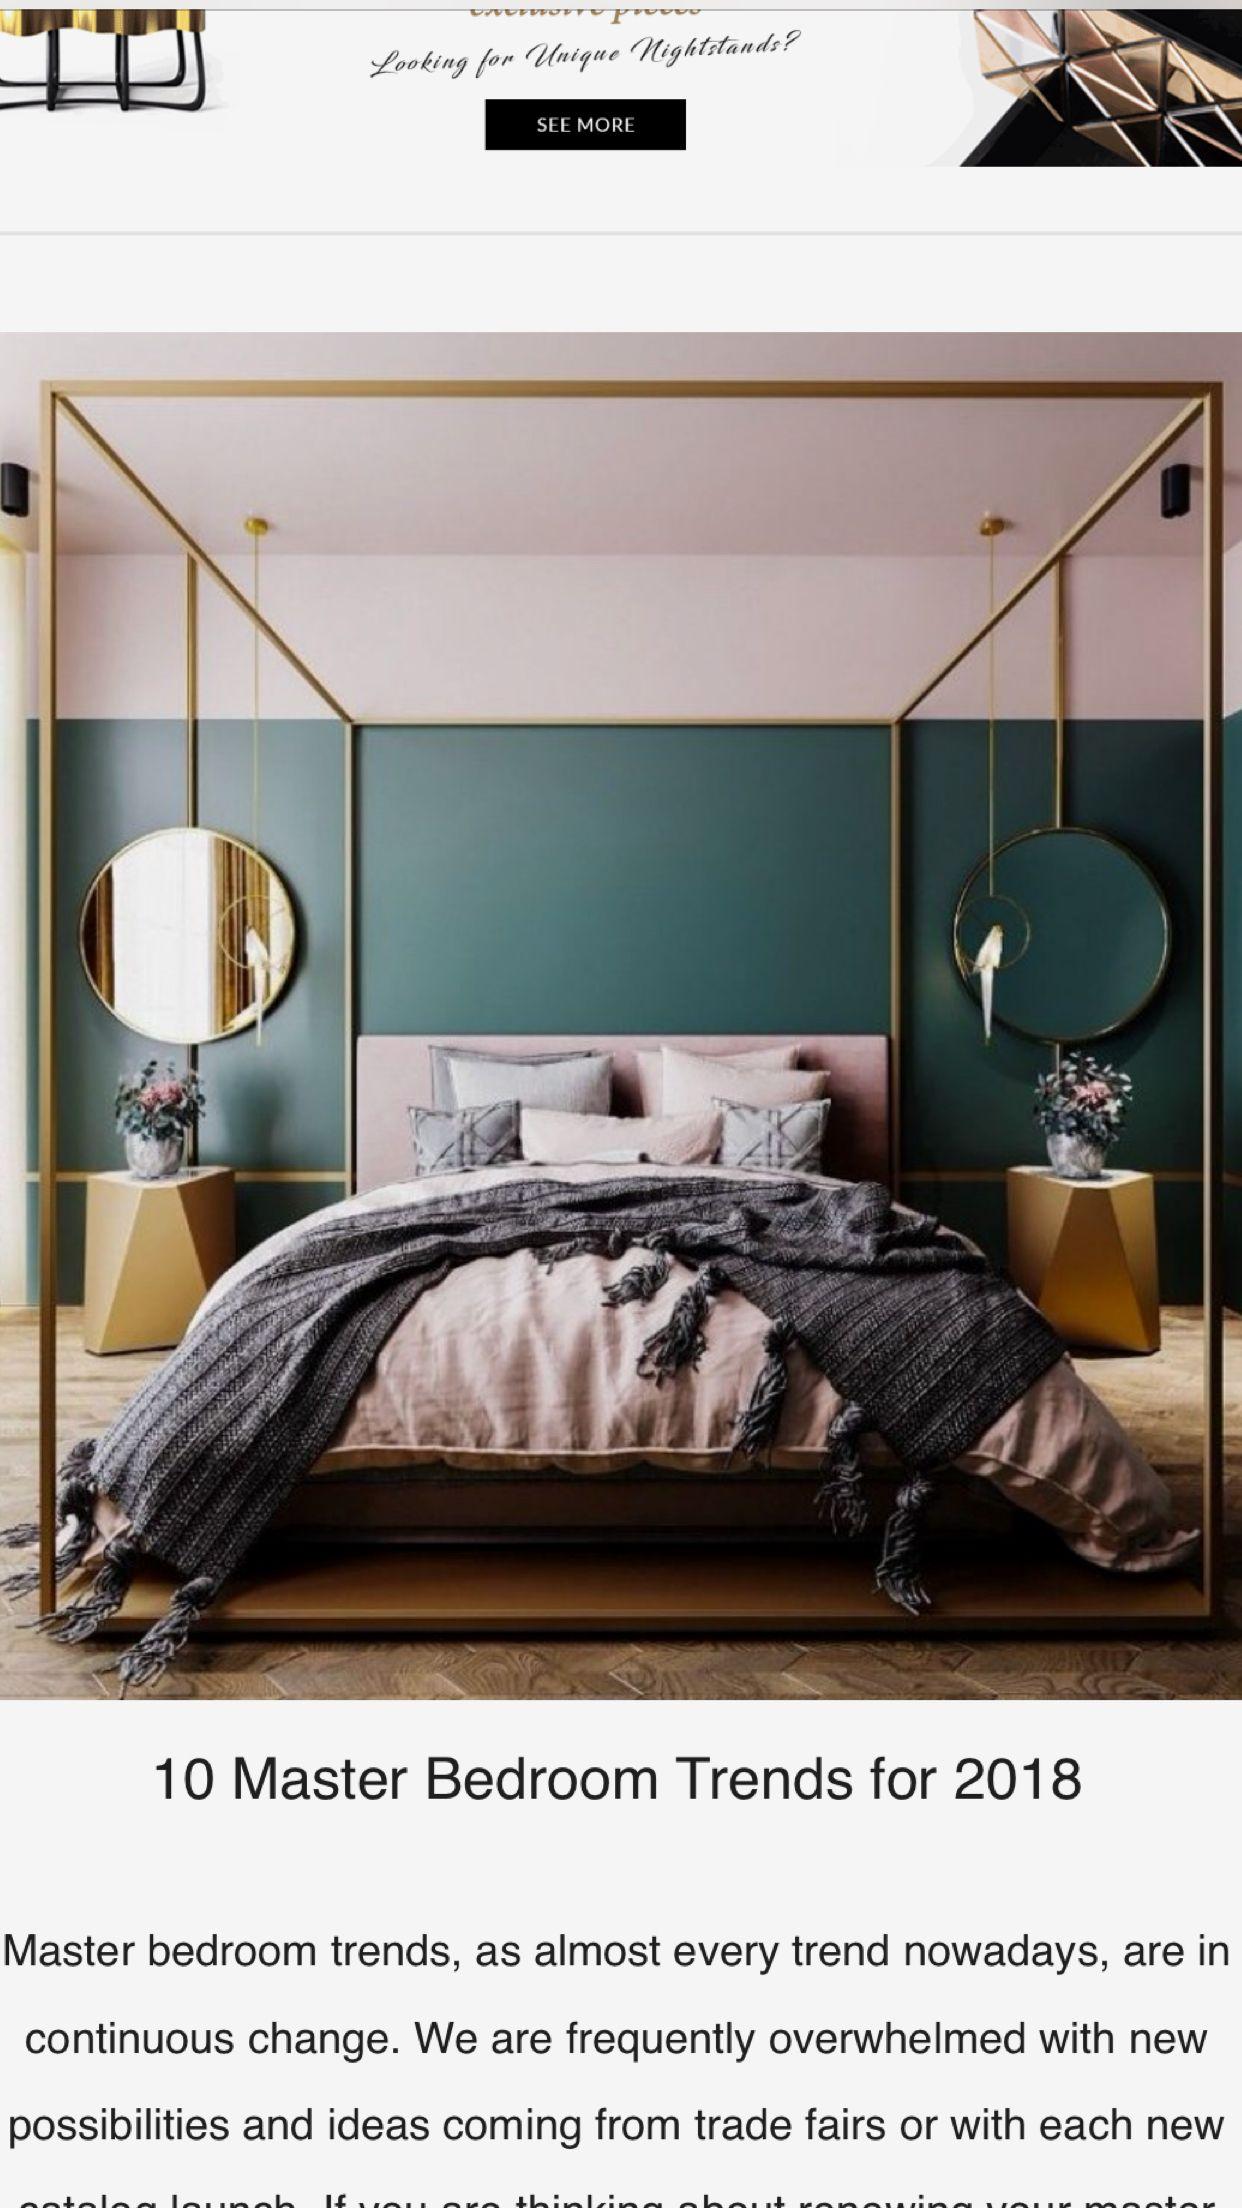 Master bedroom green  Pin by gorrgoa on interior  Pinterest  Bedrooms Master bedroom